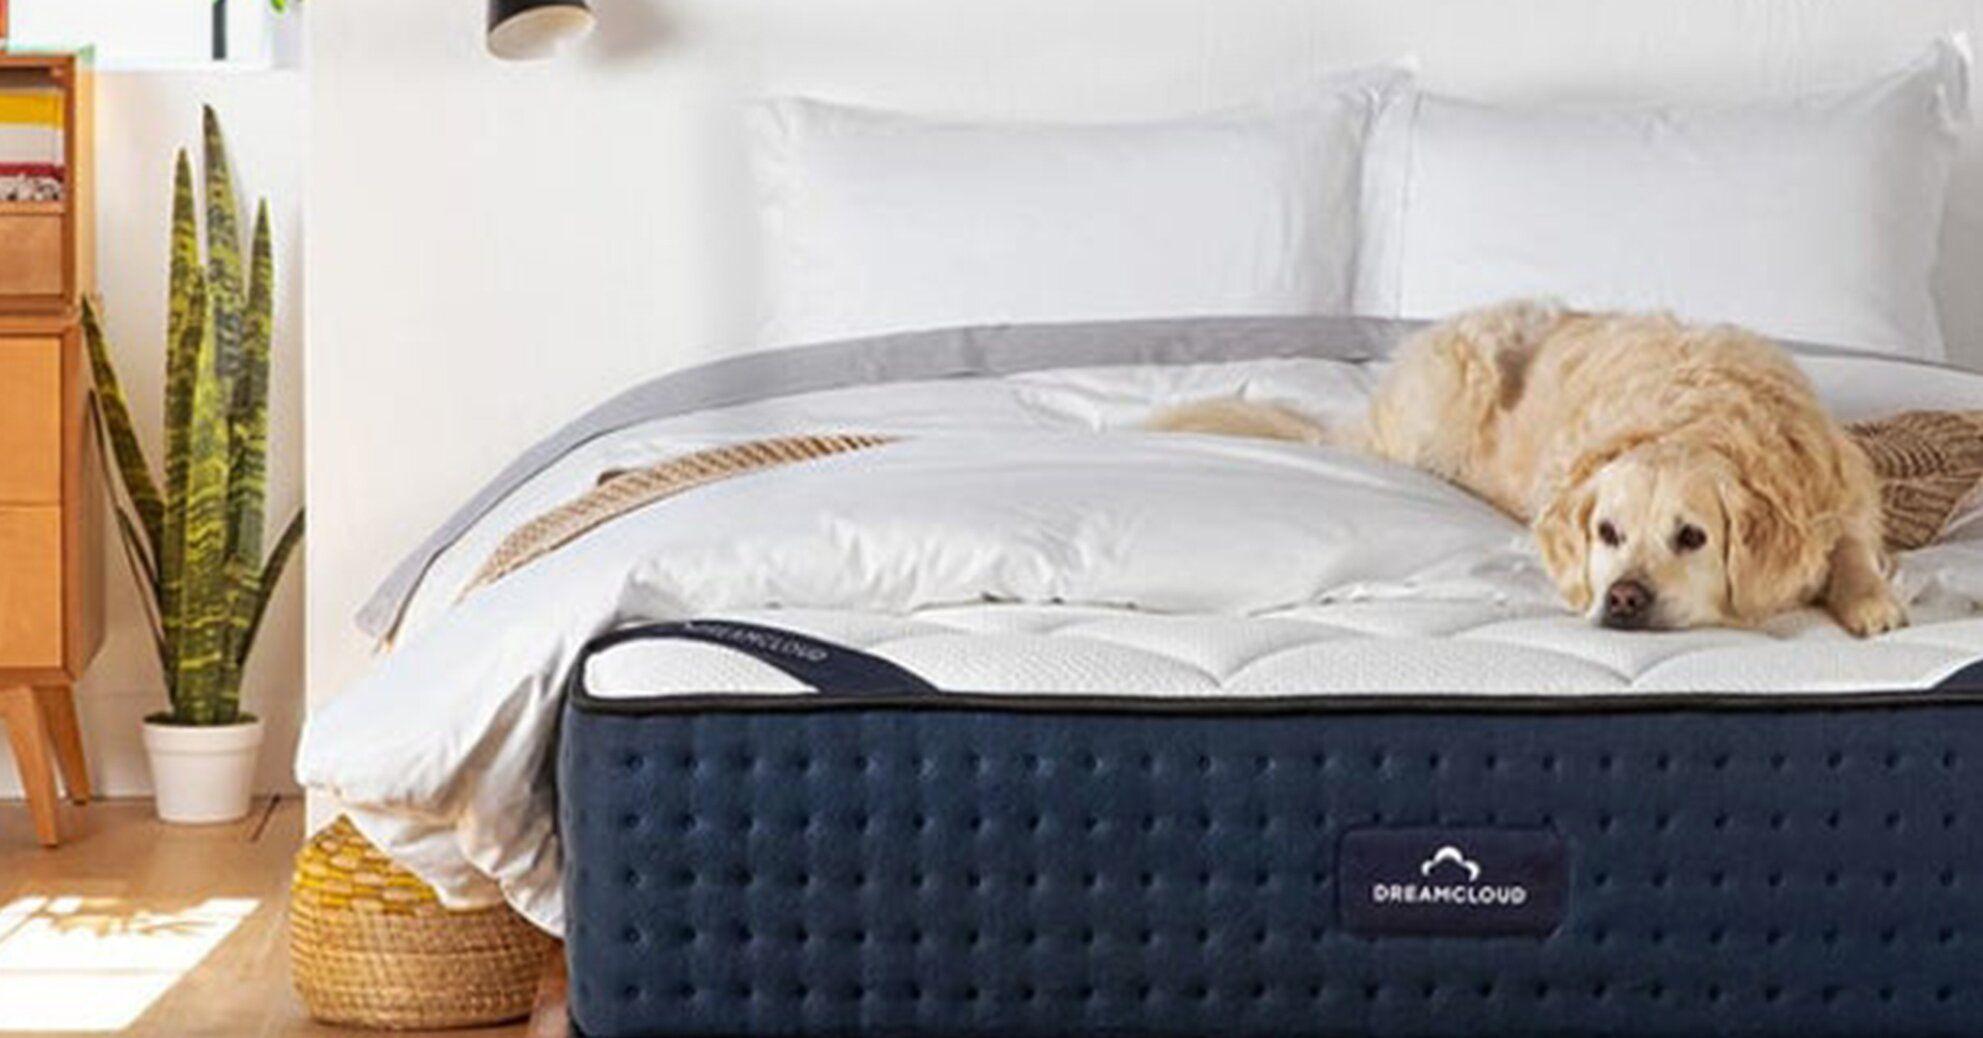 Get A Better Night S Sleep With The 10 Best Mattresses For Side Sleepers In 2020 Best Mattress Side Sleeper Best Cooling Mattress